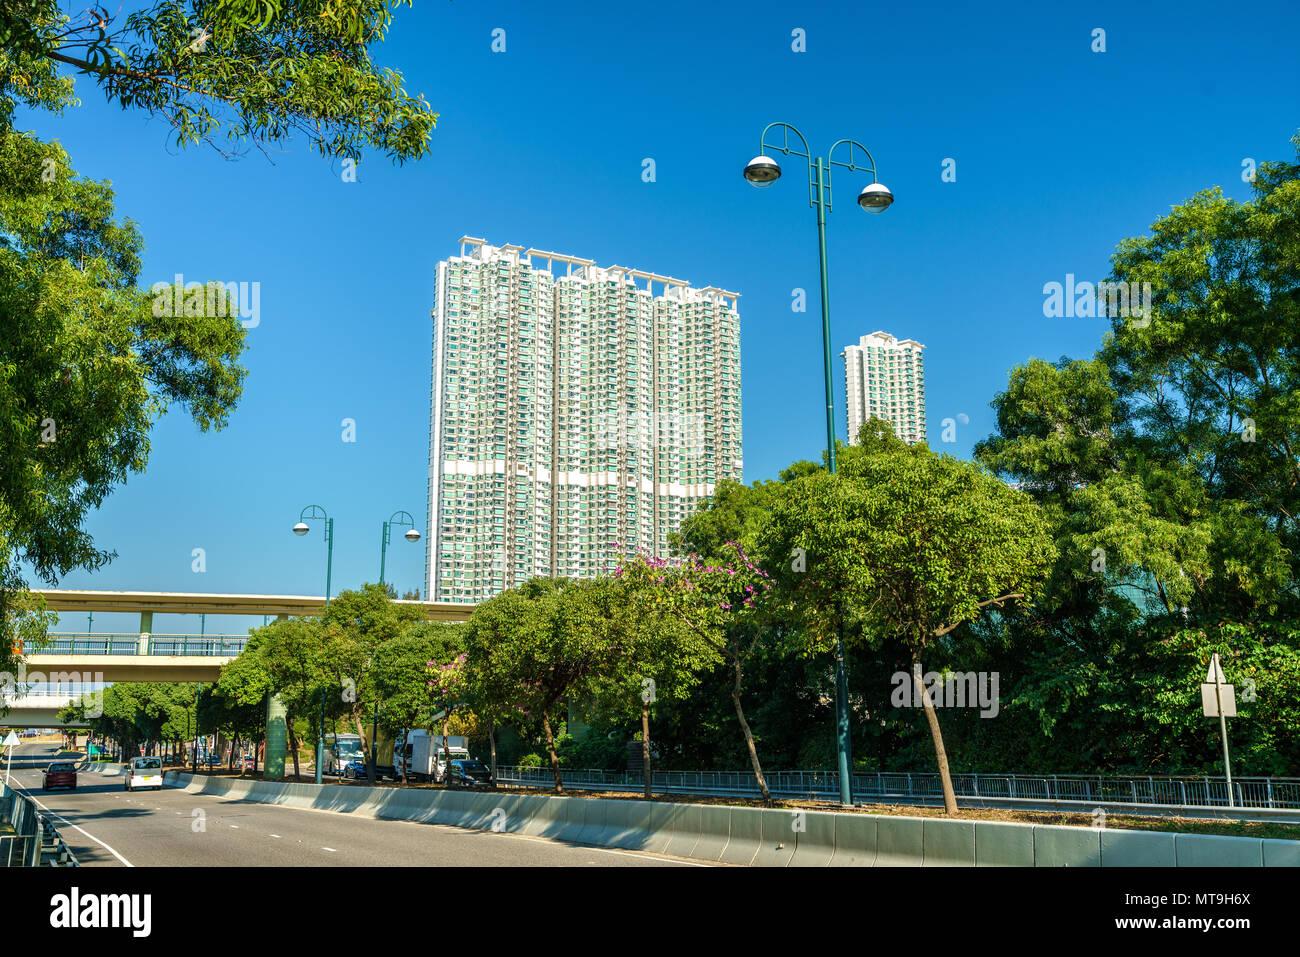 View of Tung Chung district of Hong Kong on Lantau Island - Stock Image